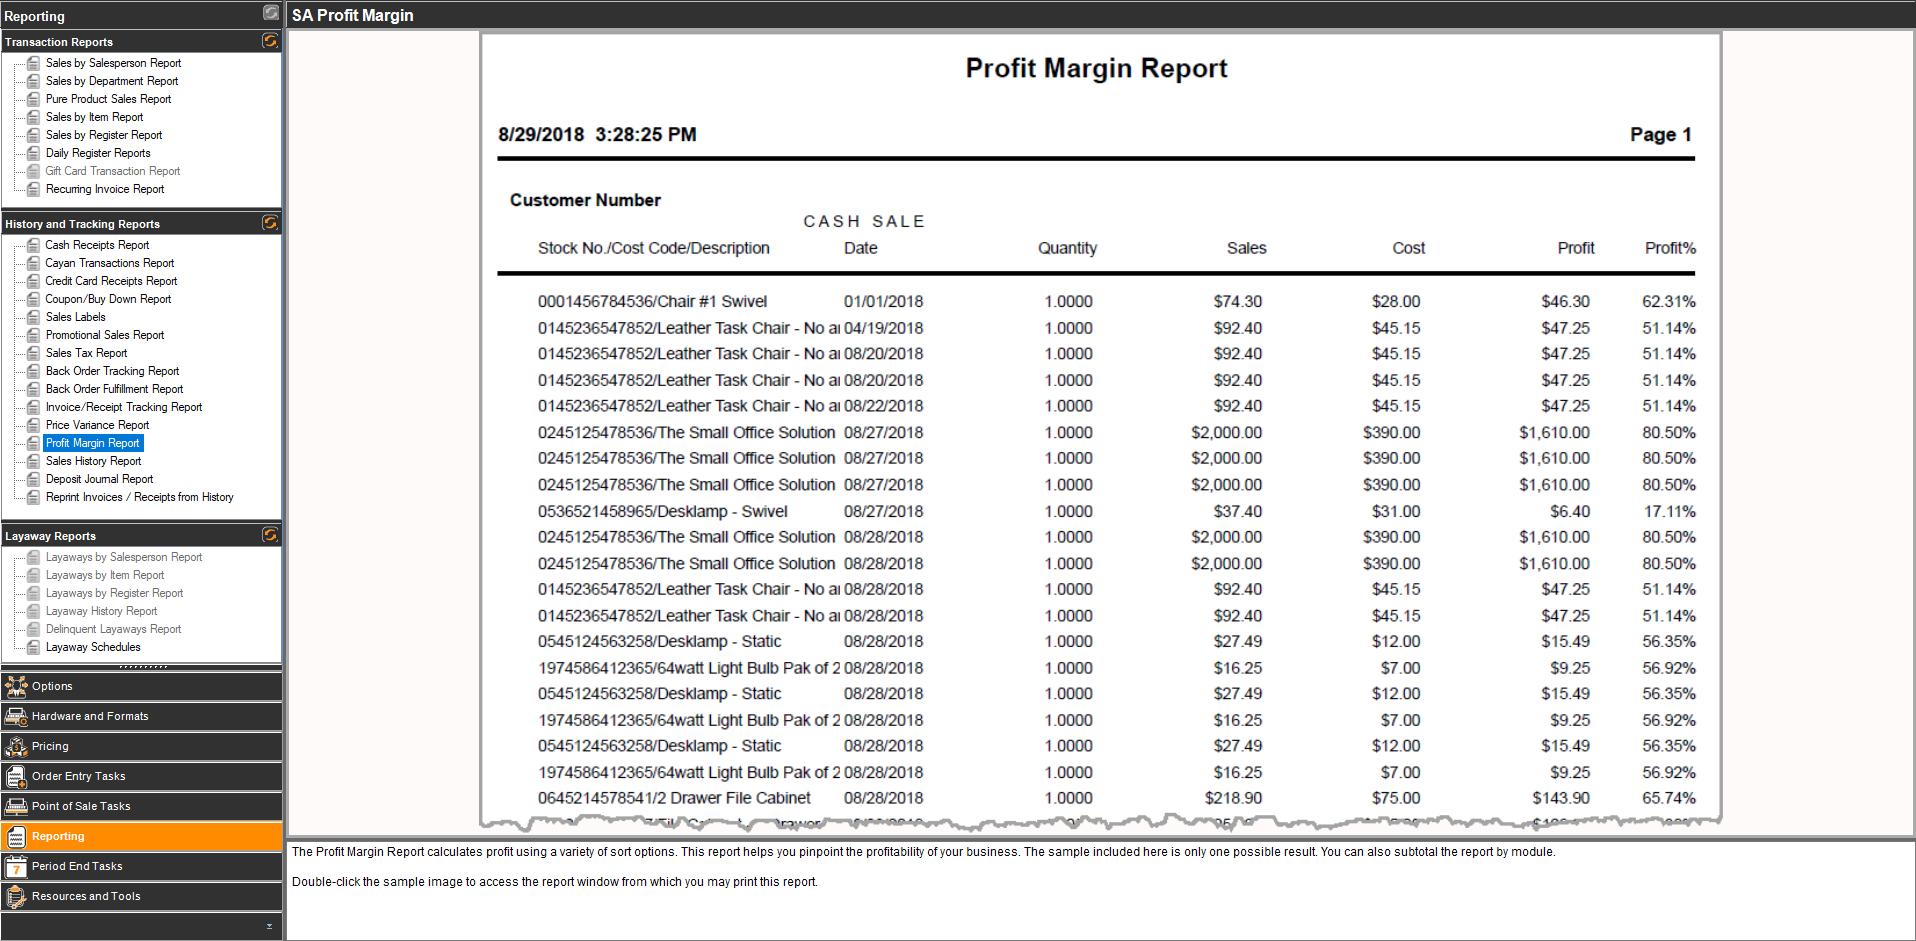 Sales Profit Margin Report